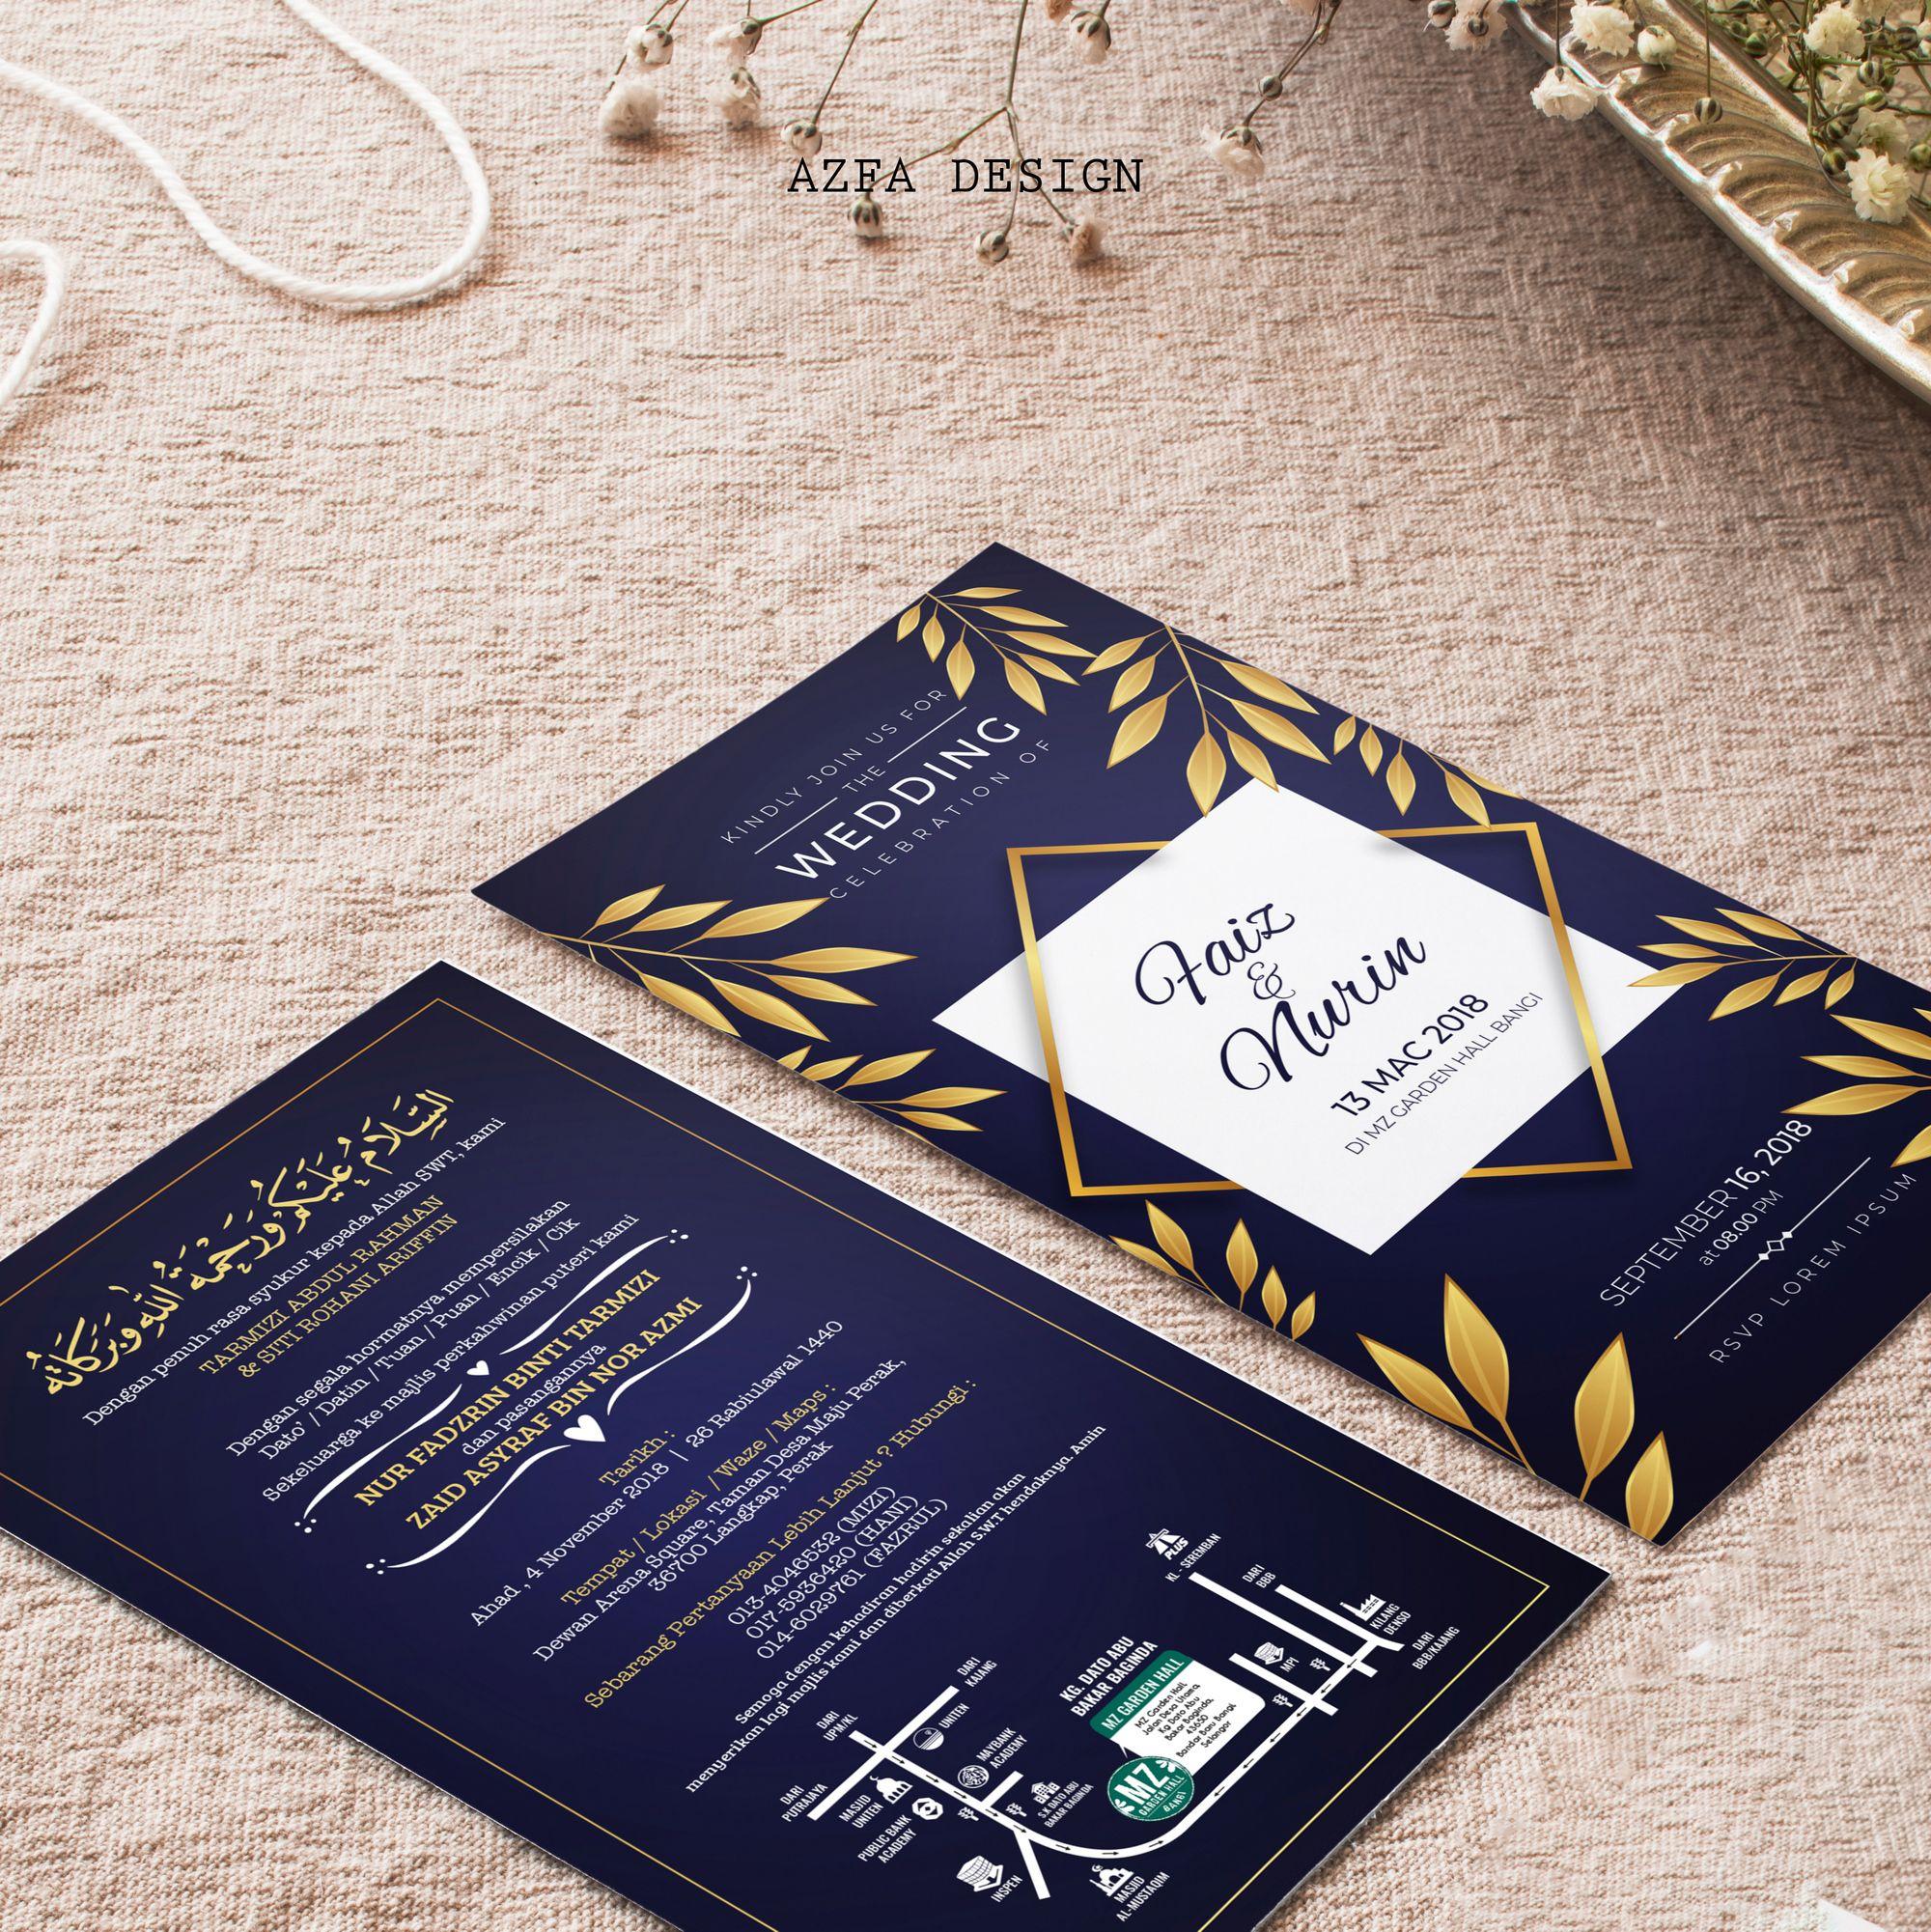 Azfadesign Kadkahwin Customize Kad Kahwin Anda Azfa Design Sedia Membantu Eh Takna Invitation Cards Invitations Cards